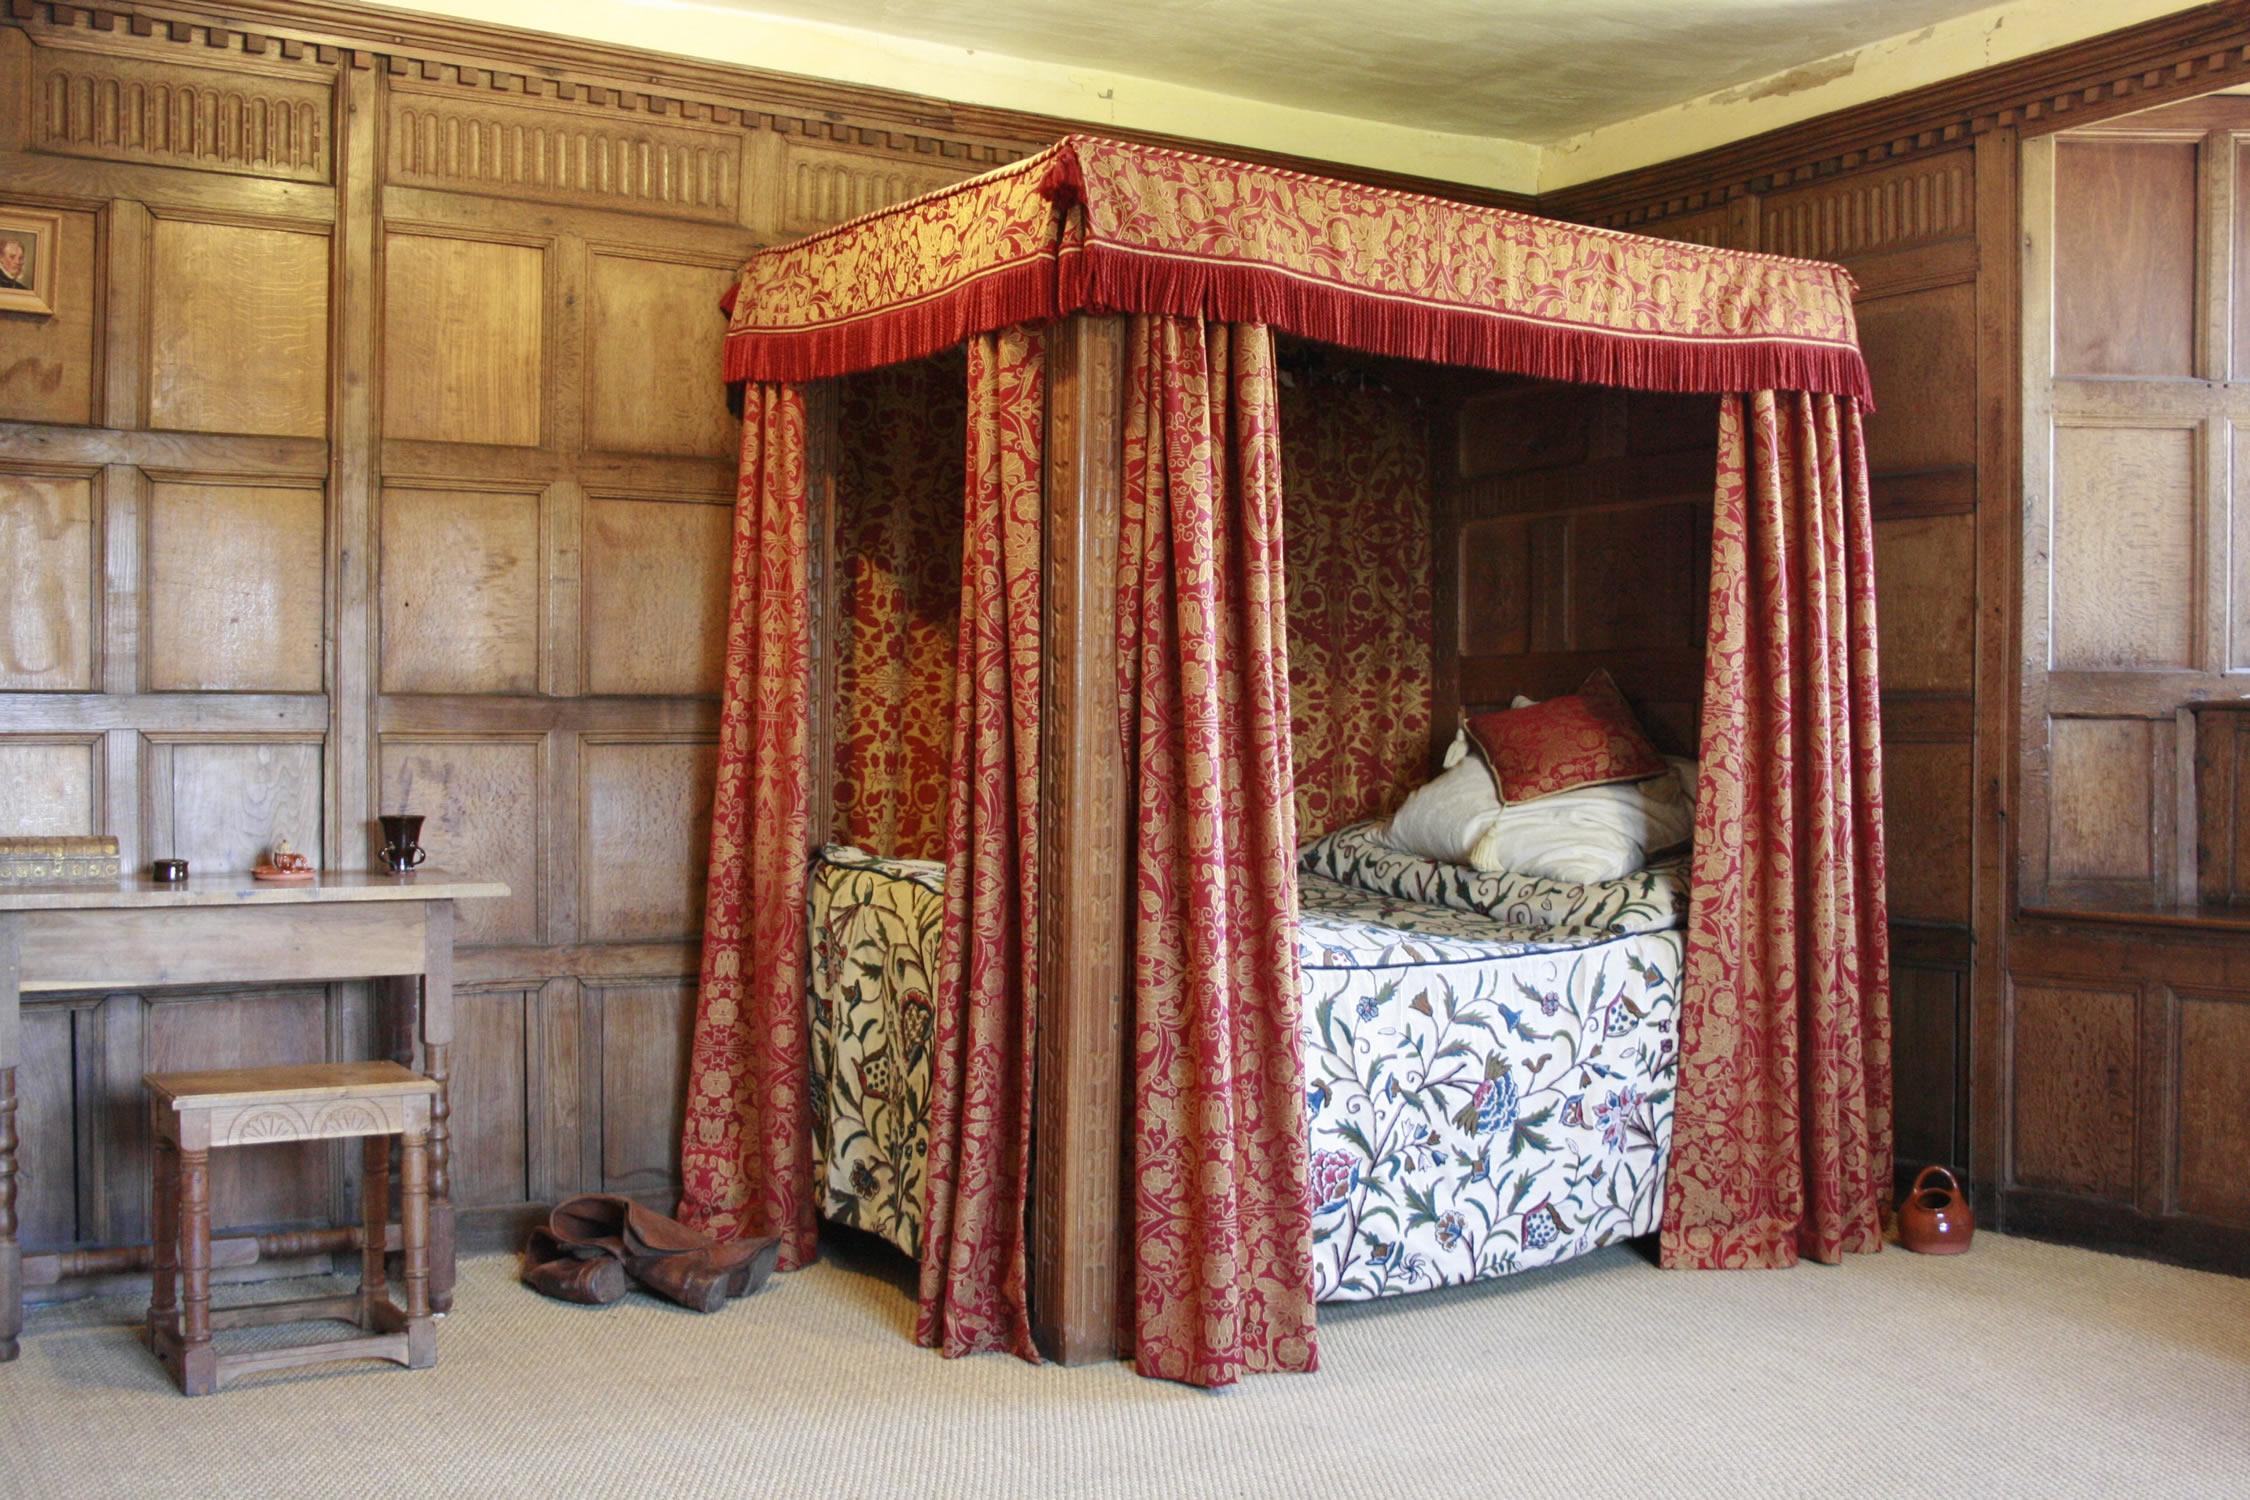 Bedchamber at Llancaiach Fawr - 'Walsingham'